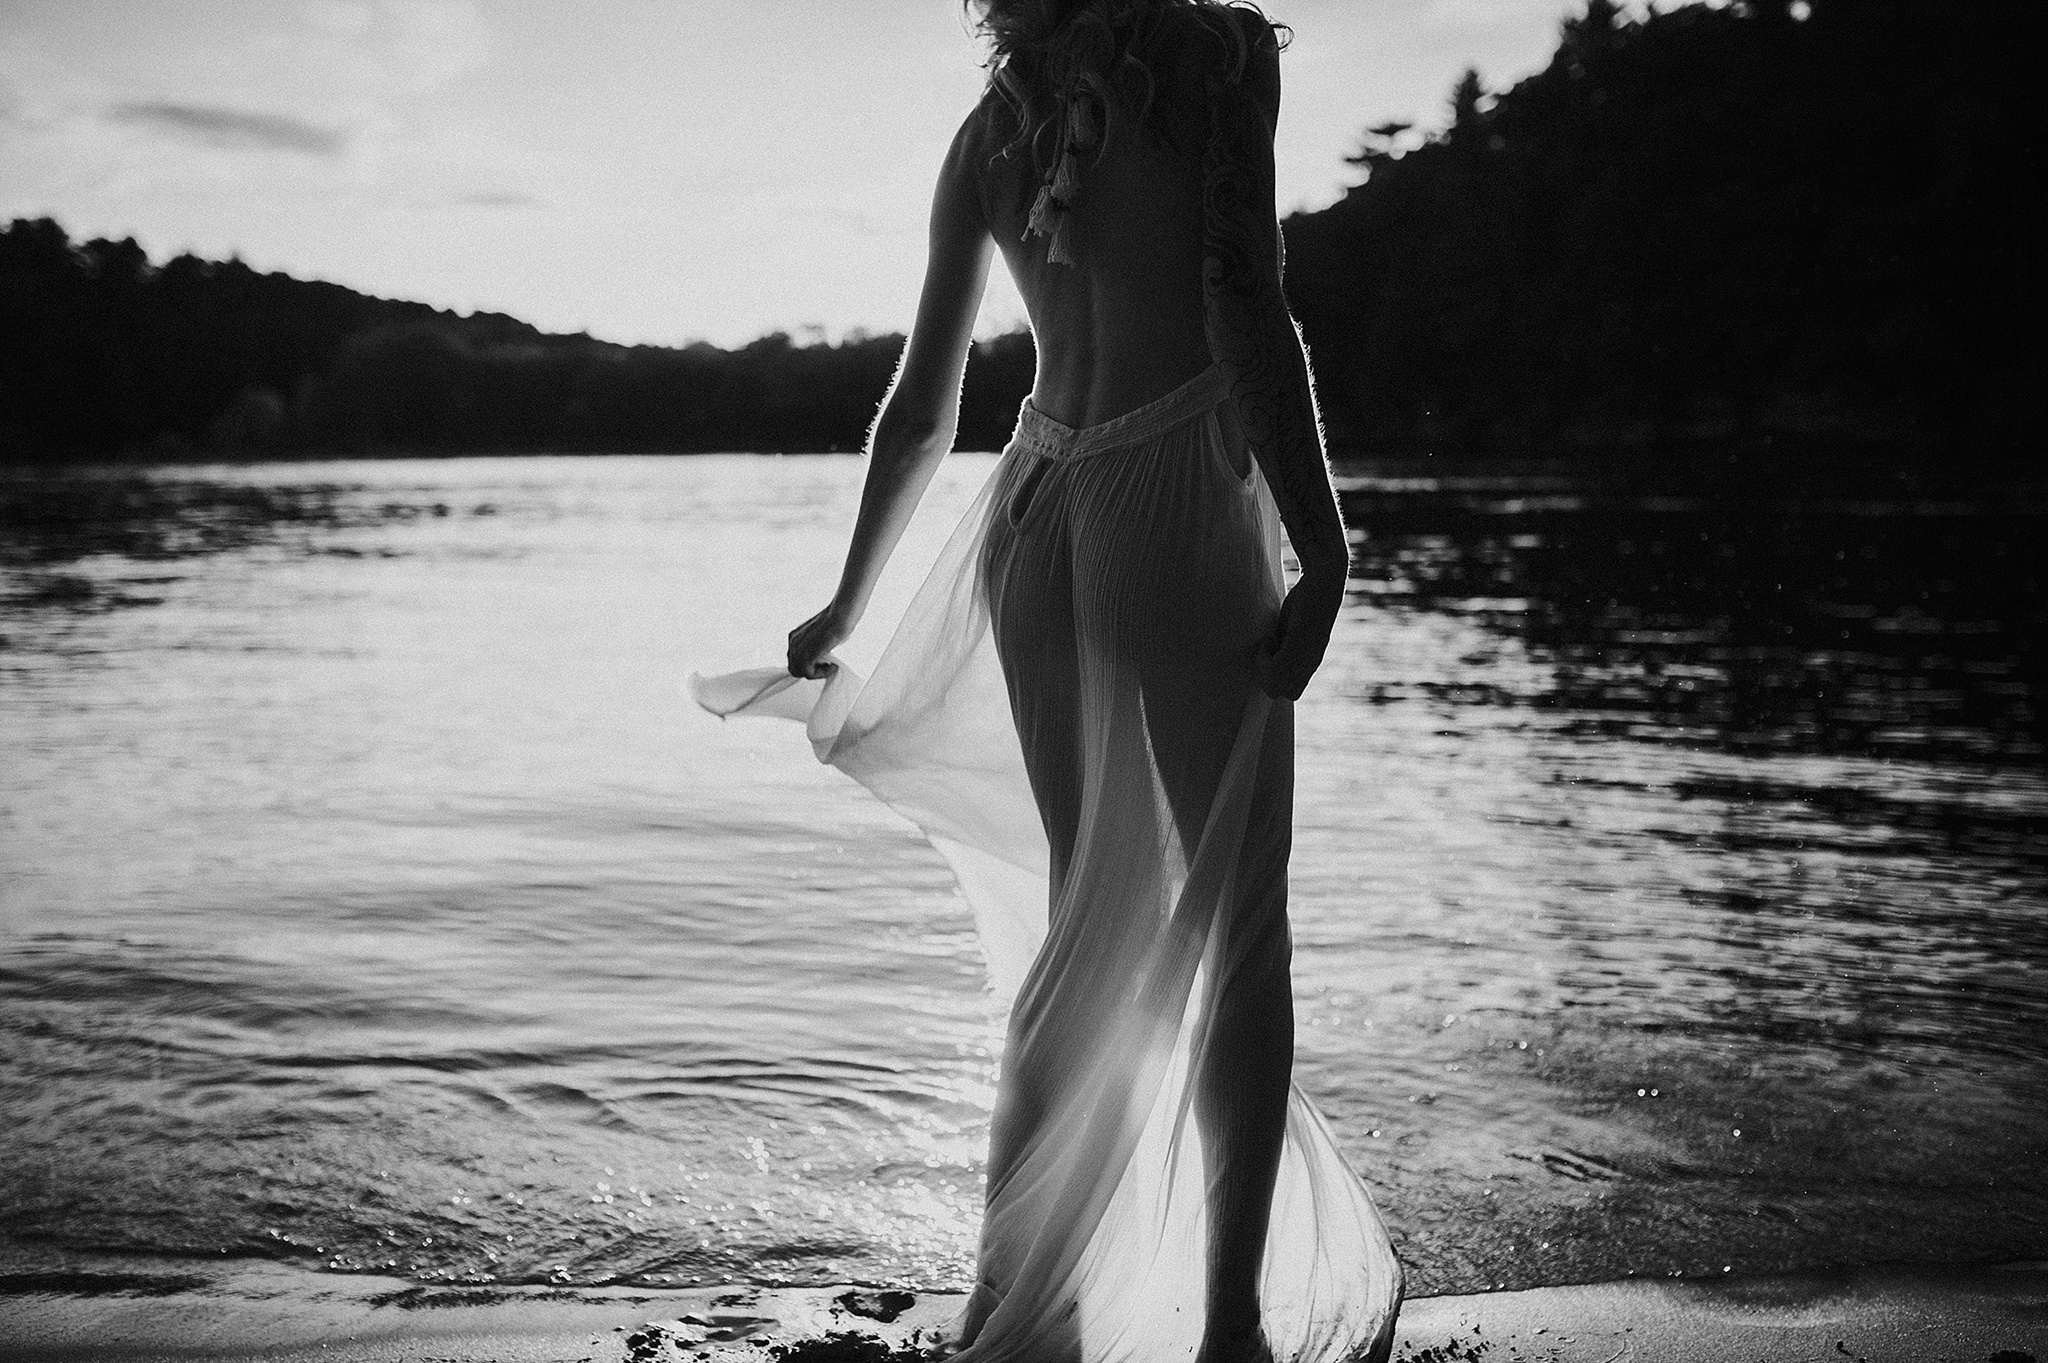 outdoor-boudoir-photographer-water_10.jpg